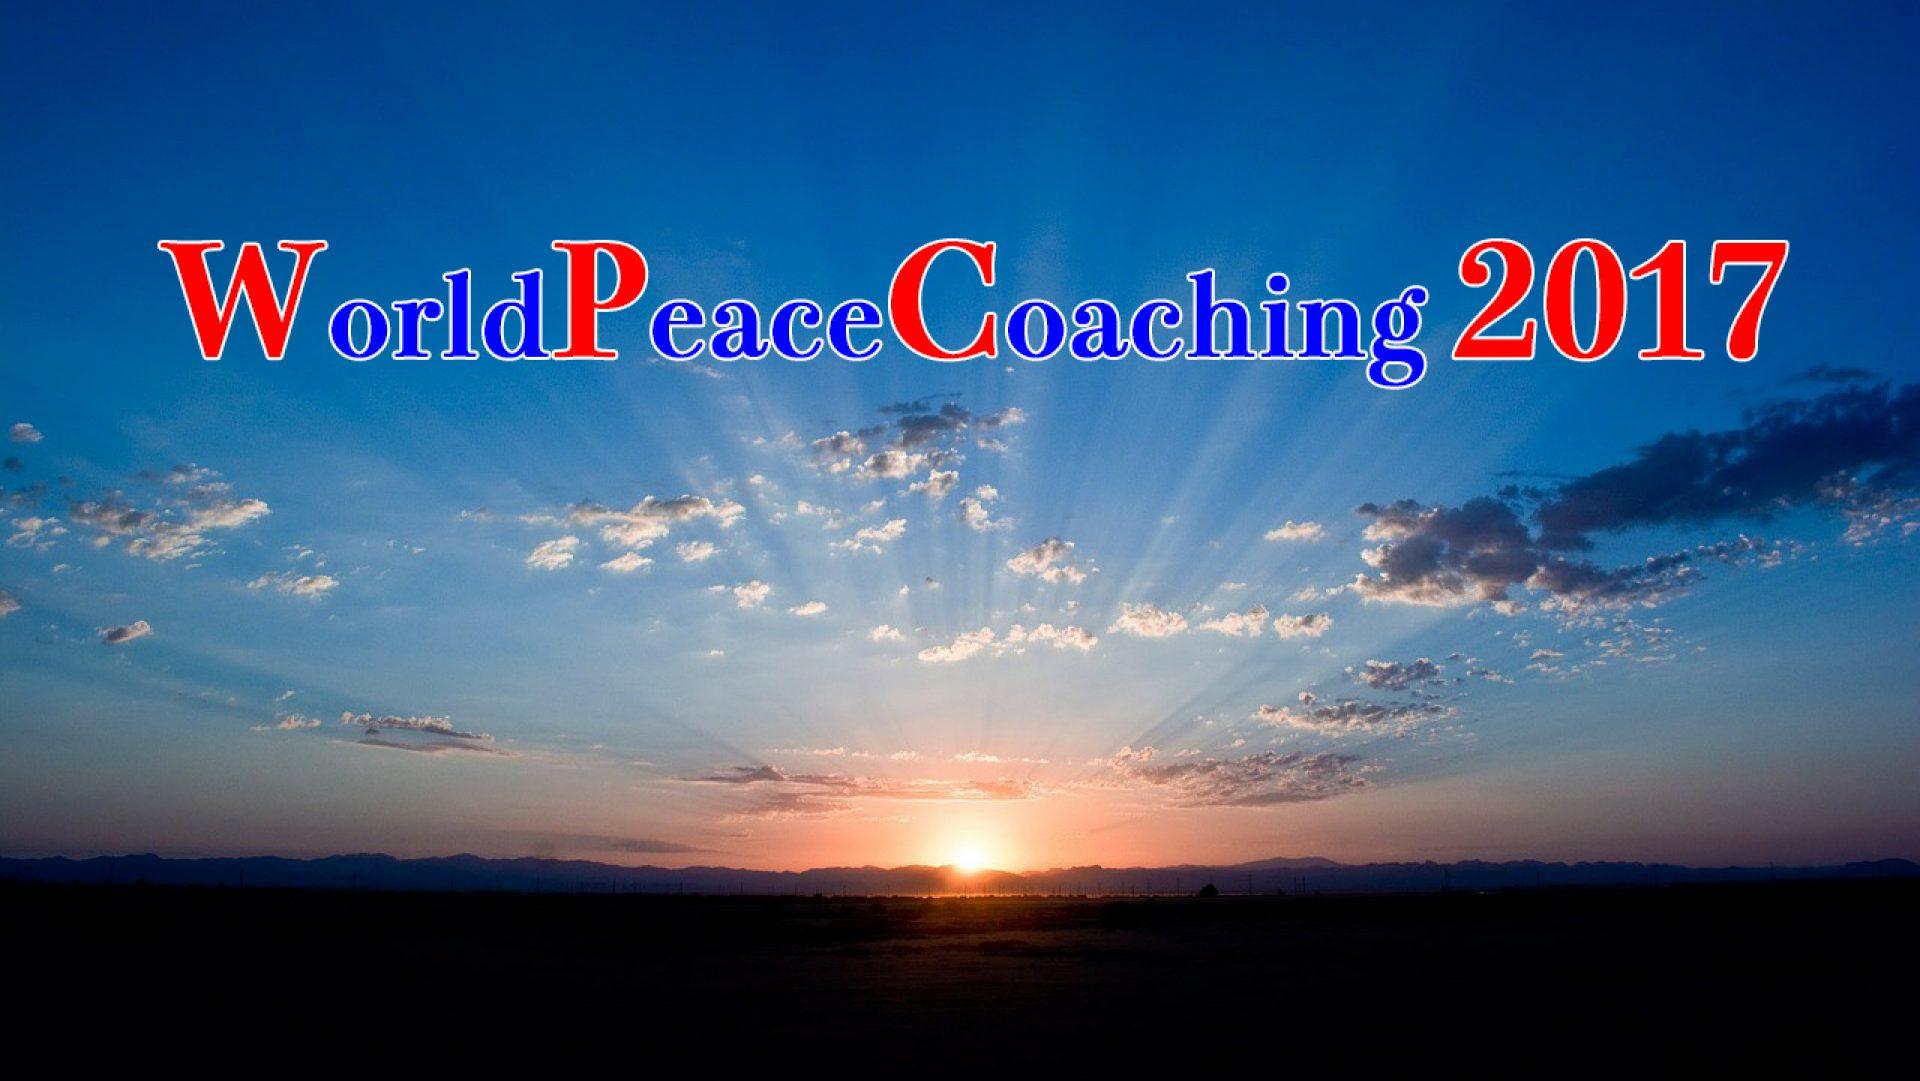 WorldPeaceCoaching